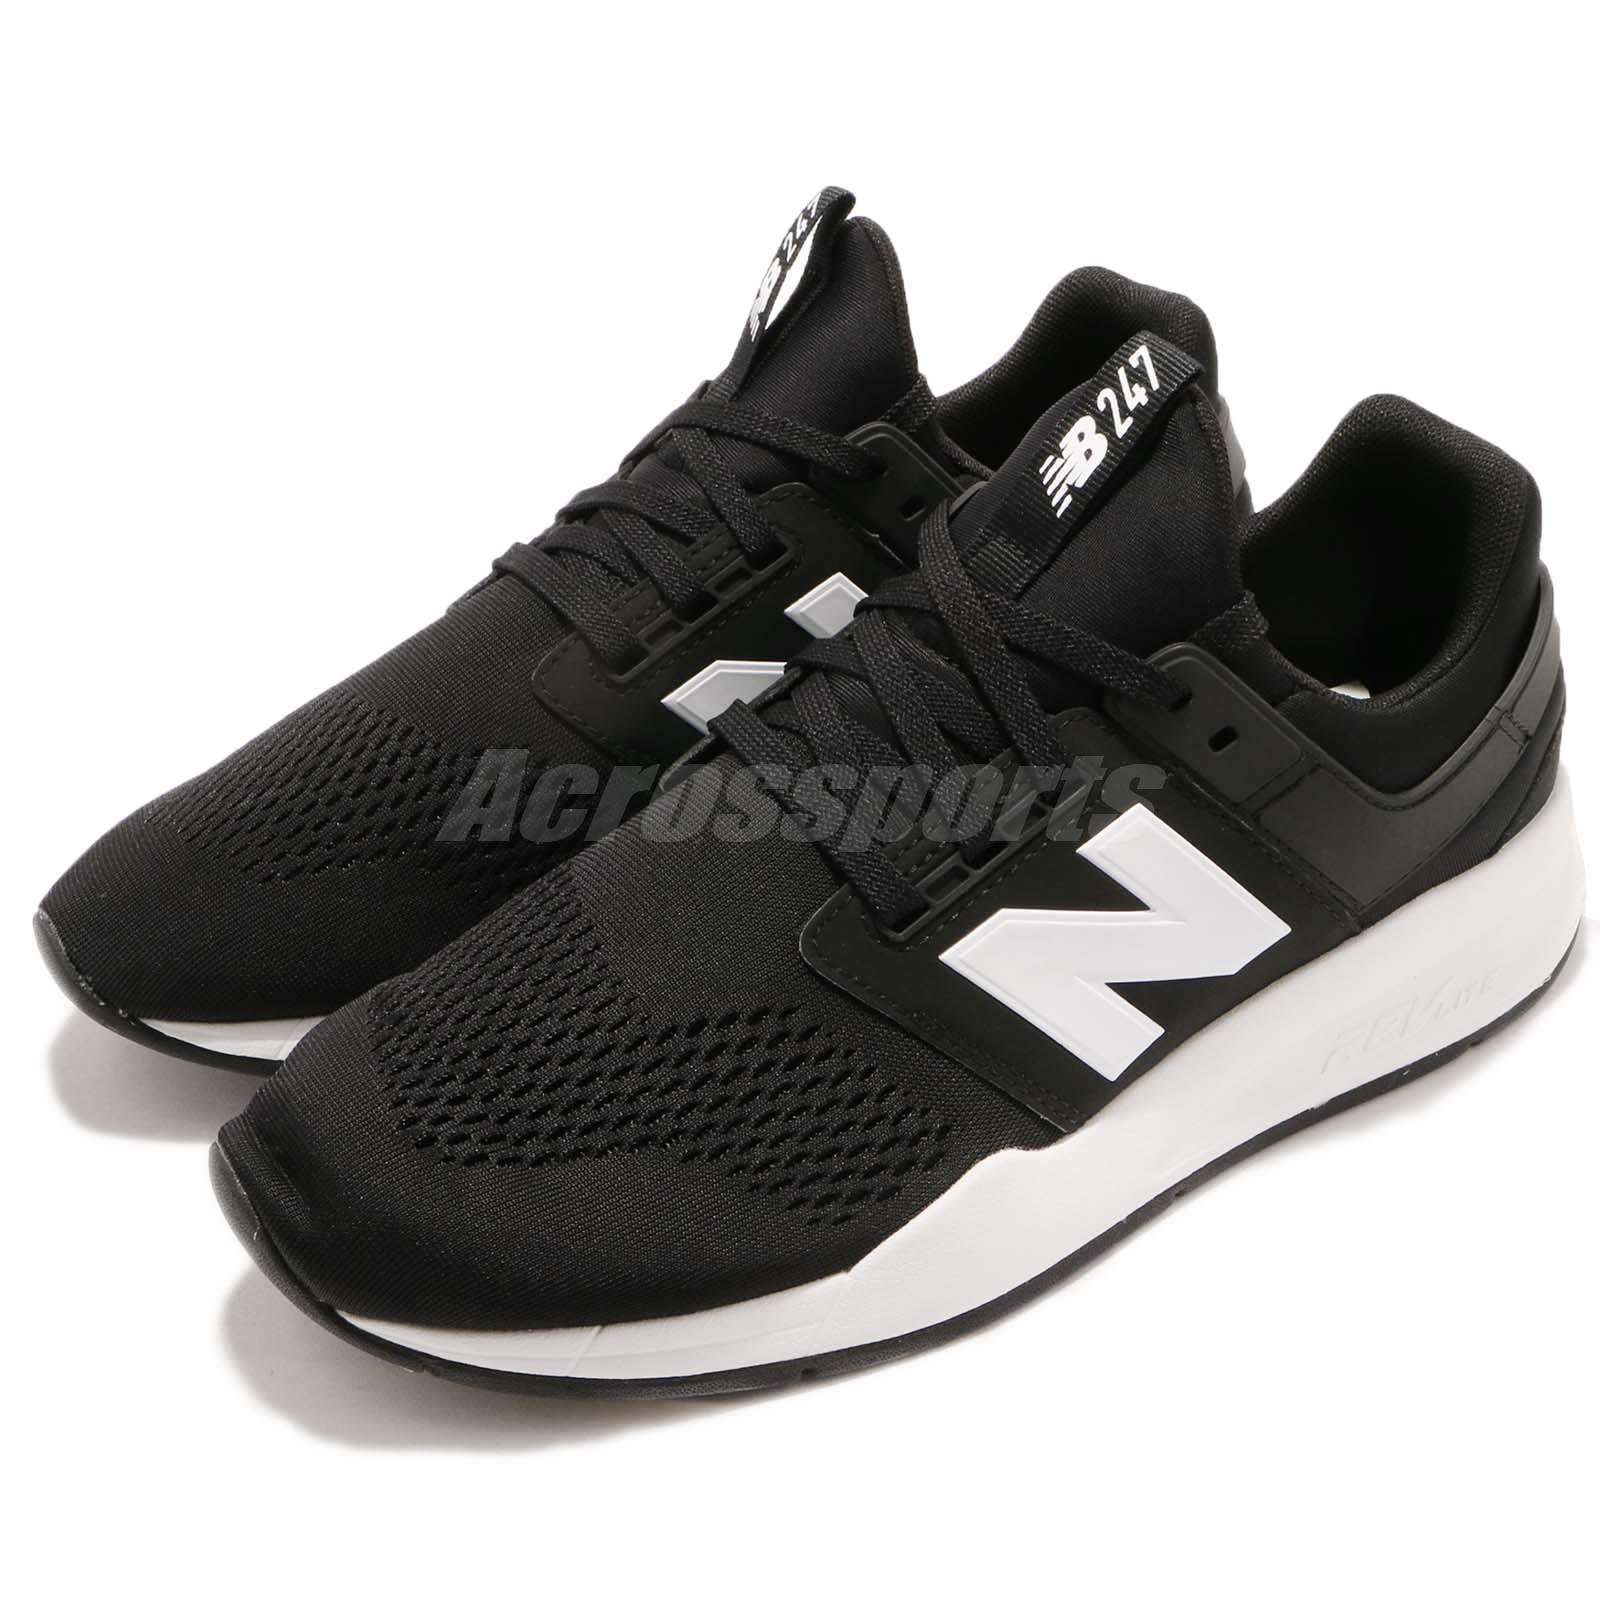 New Balance MS247EB D Black White Men